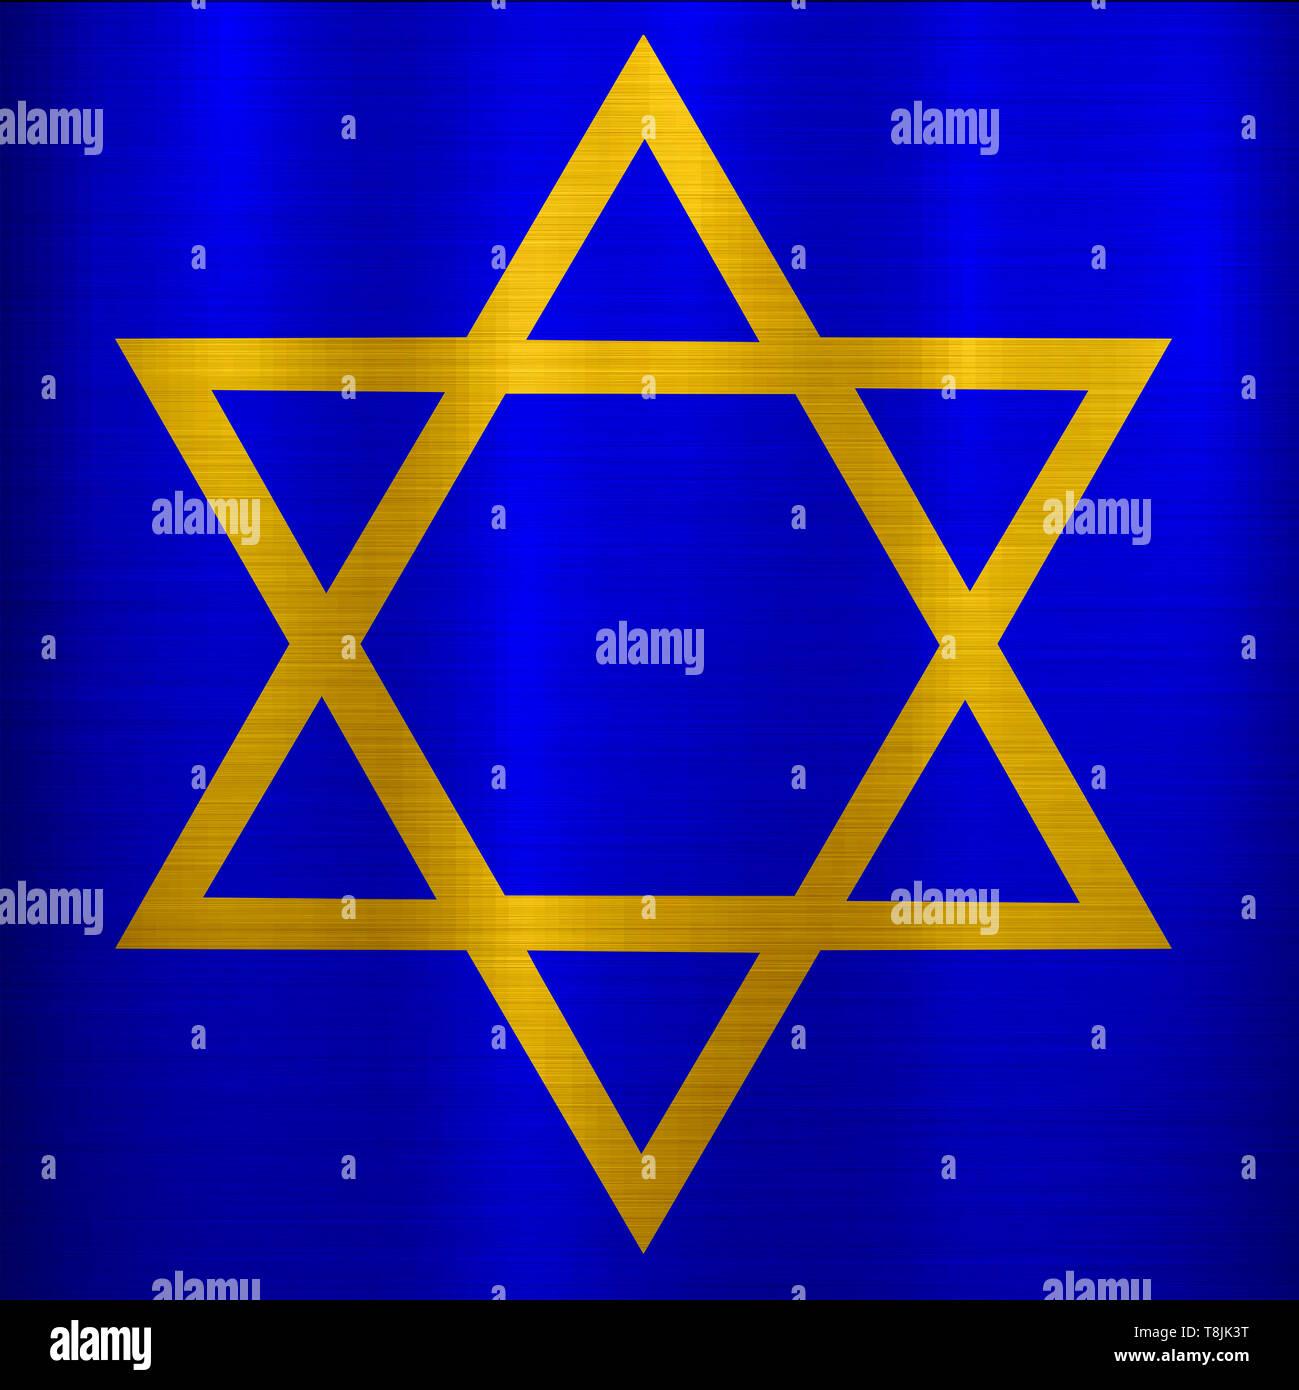 star of david judaism jewish religion blue golden metallic illustration - Stock Image